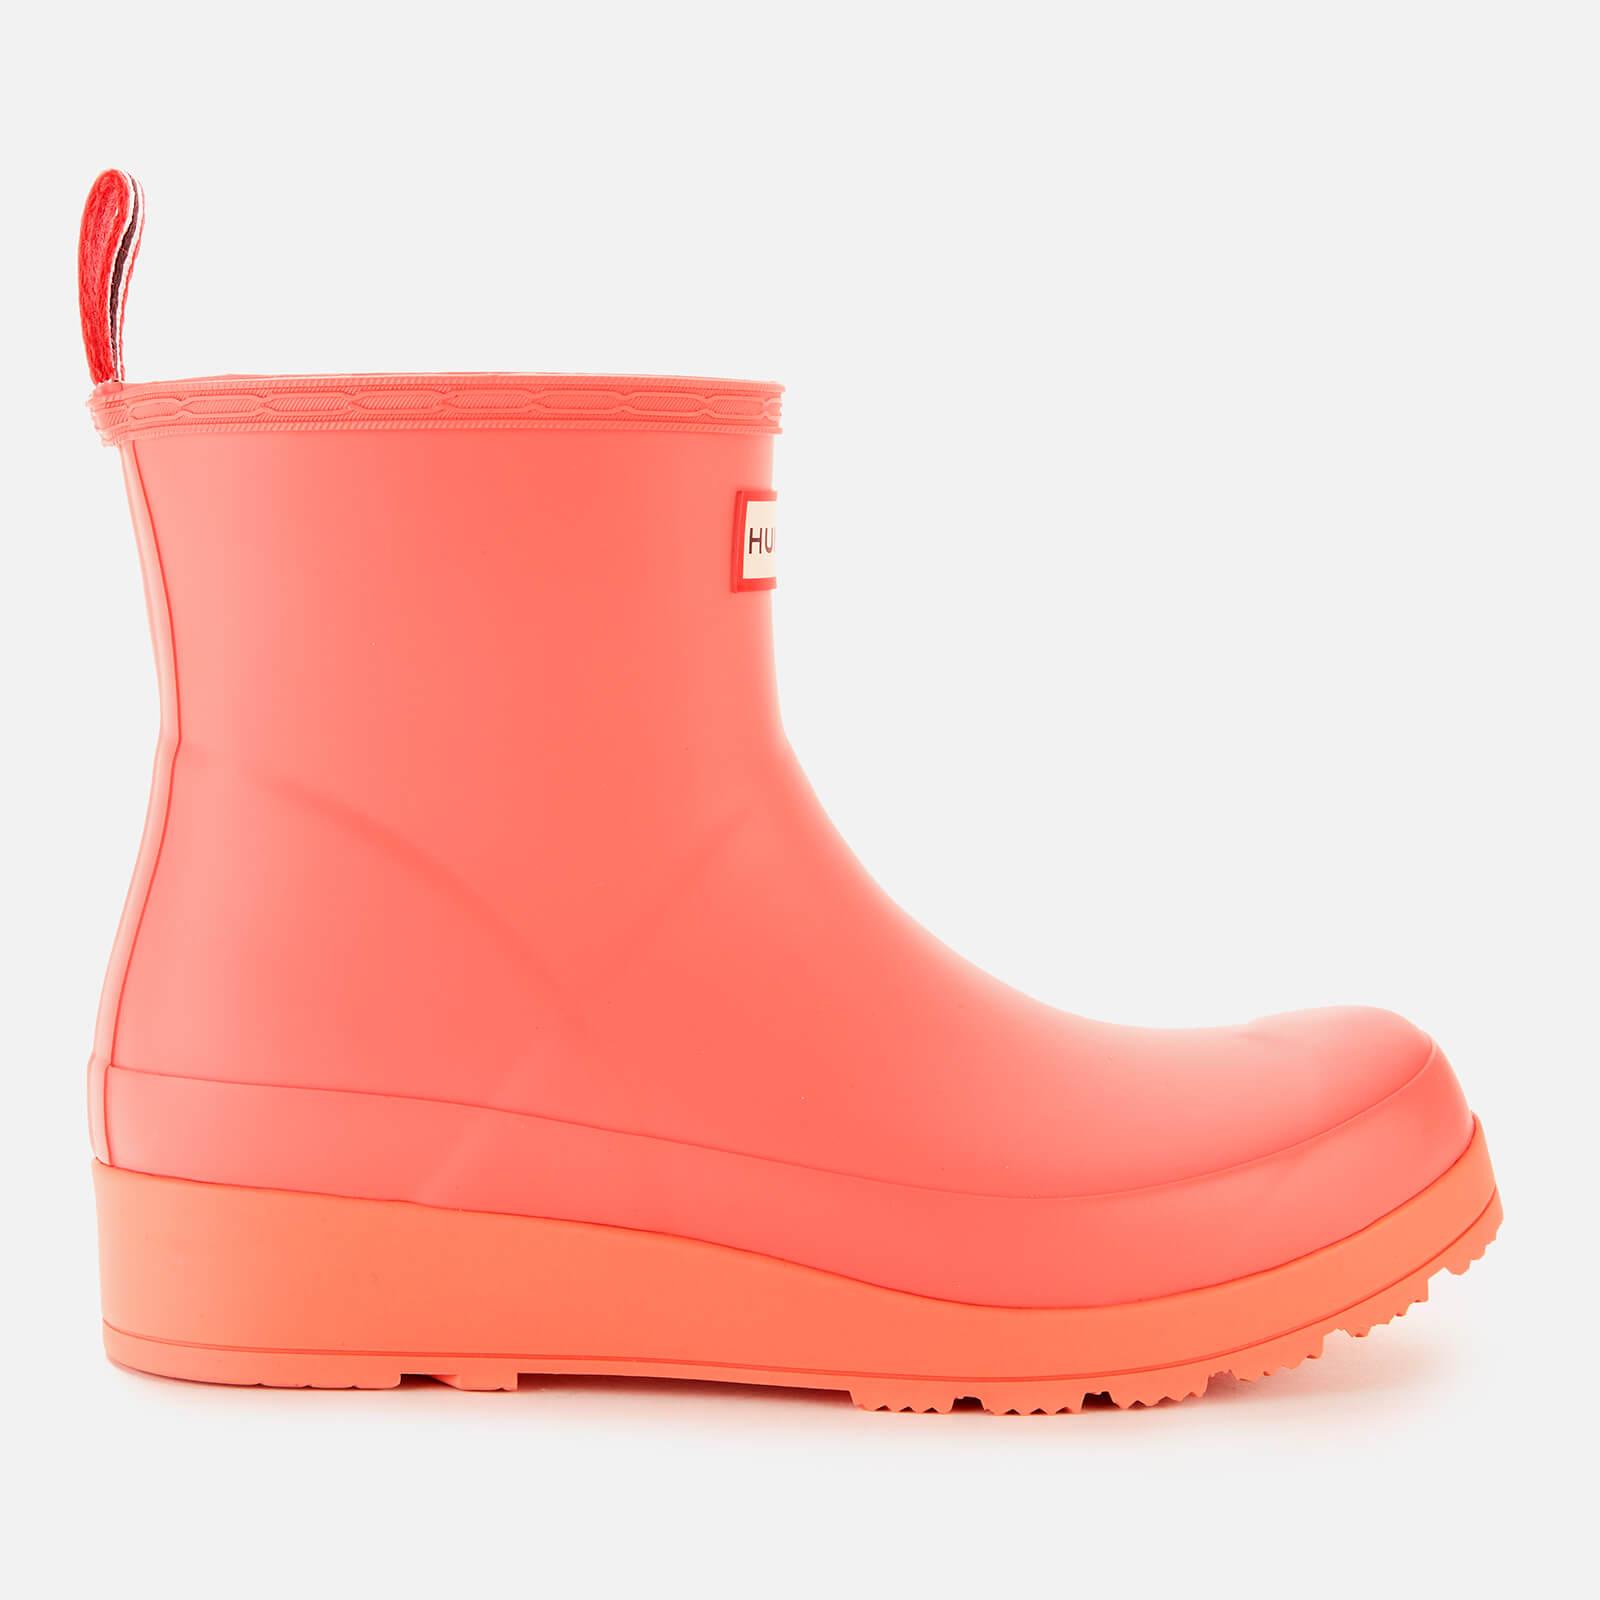 Hunter Women's Original Play Short Boots - Rhythmic Pink